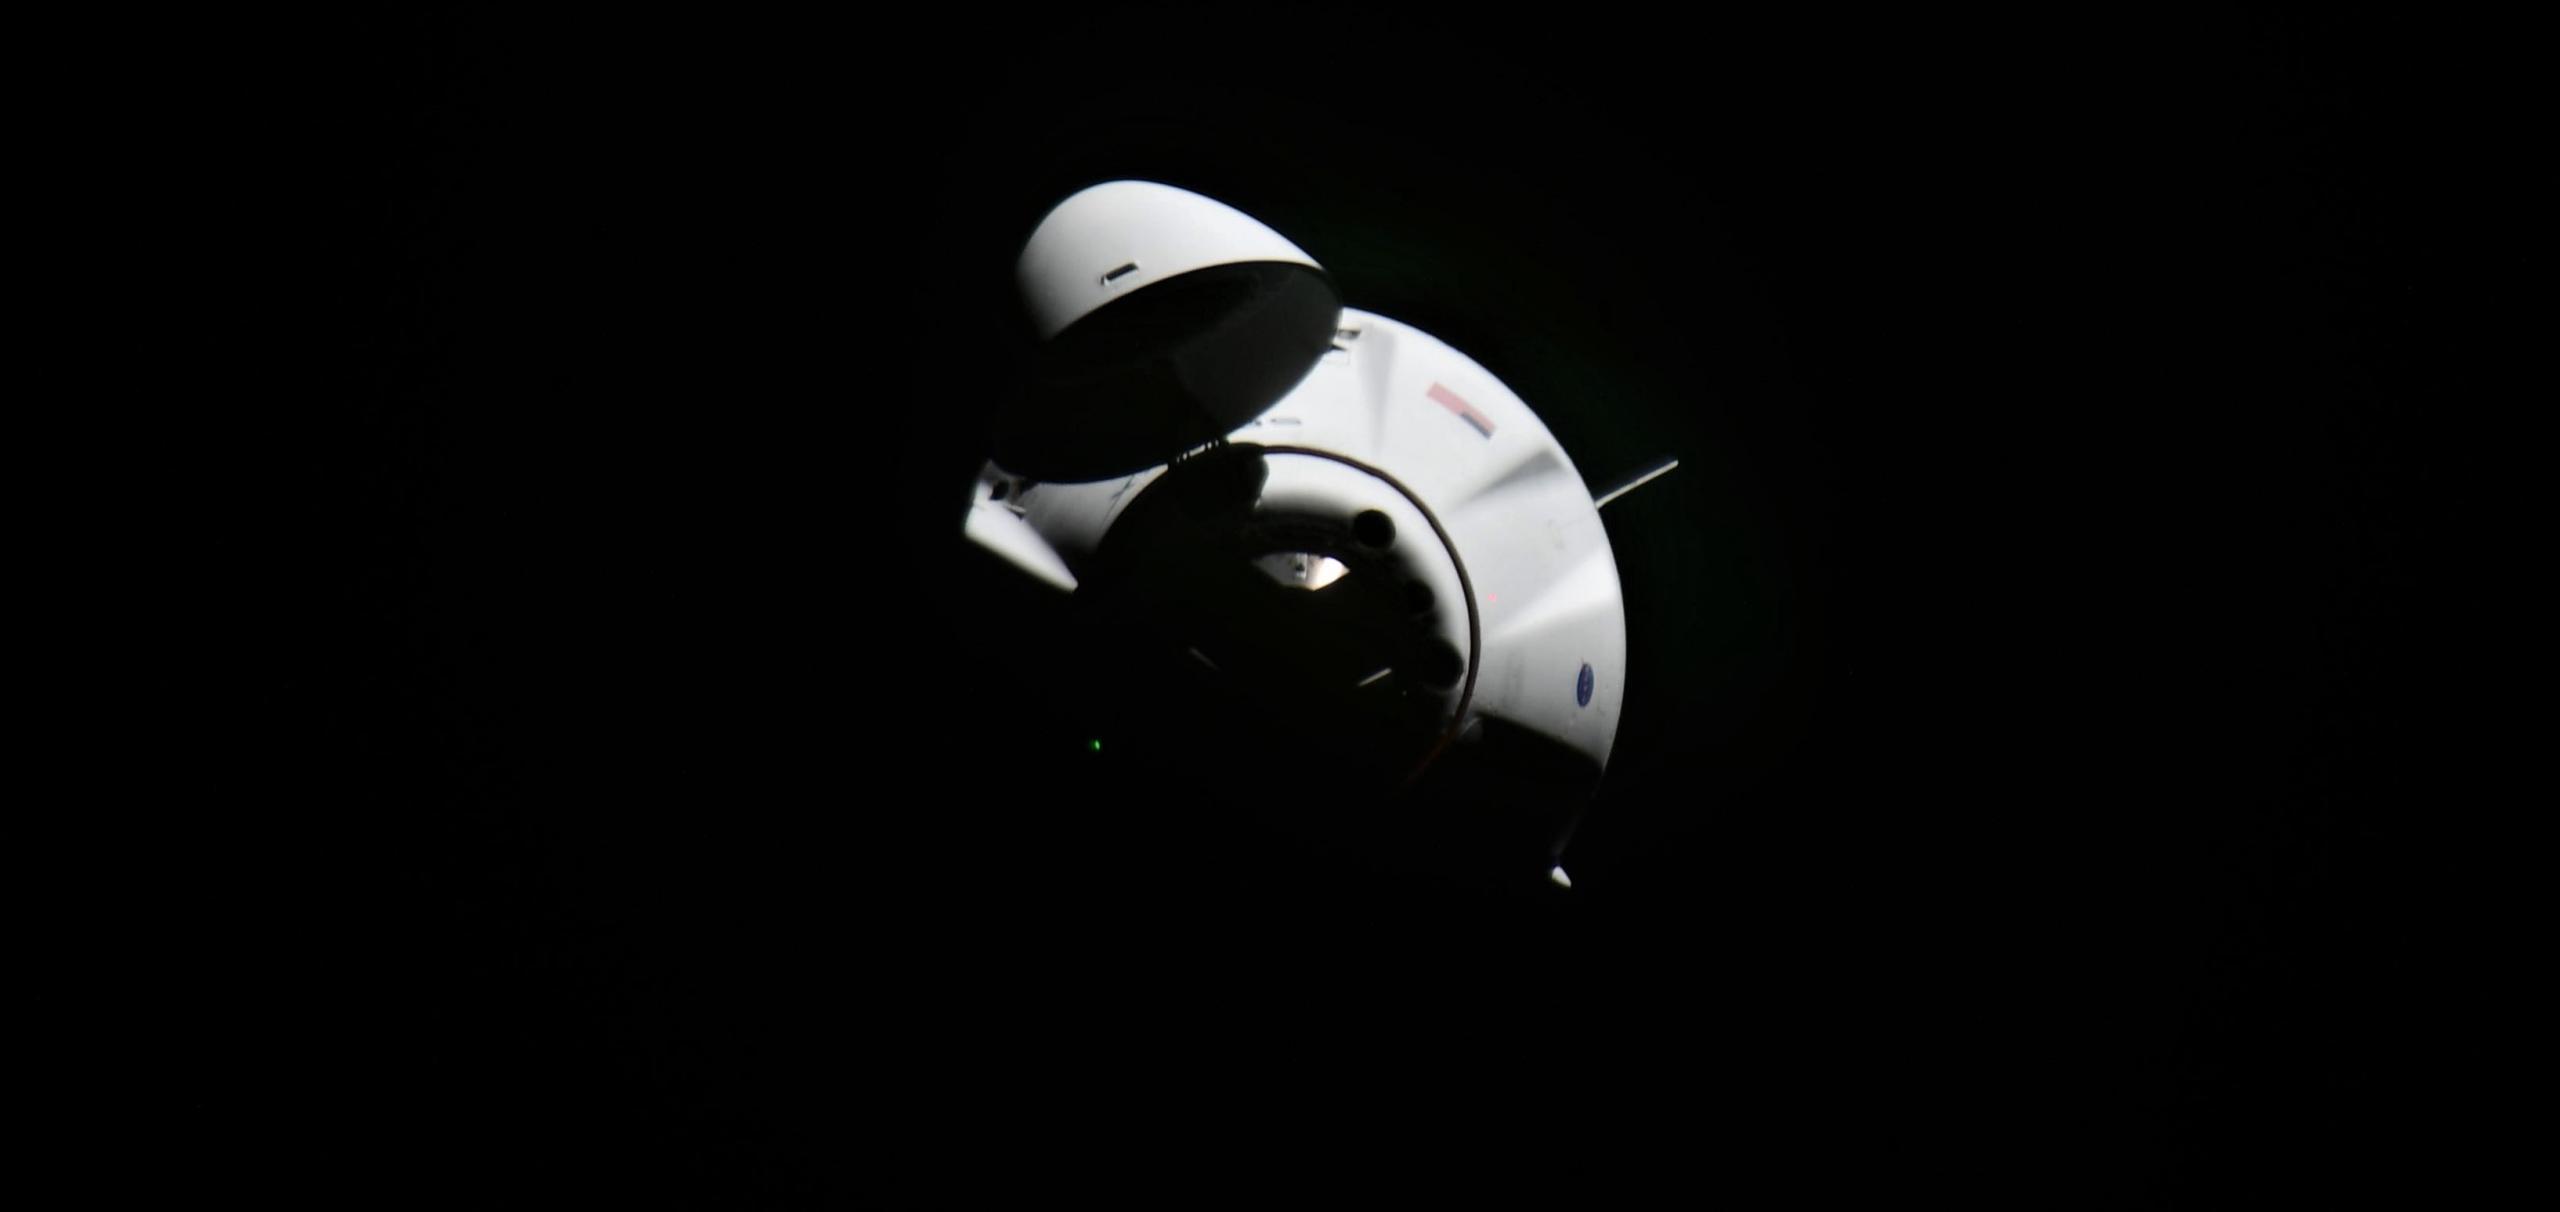 CRS-21 Cargo Dragon 2 120720 (Sergey Kud-Sverchkov) ISS arrival 4 crop (c)